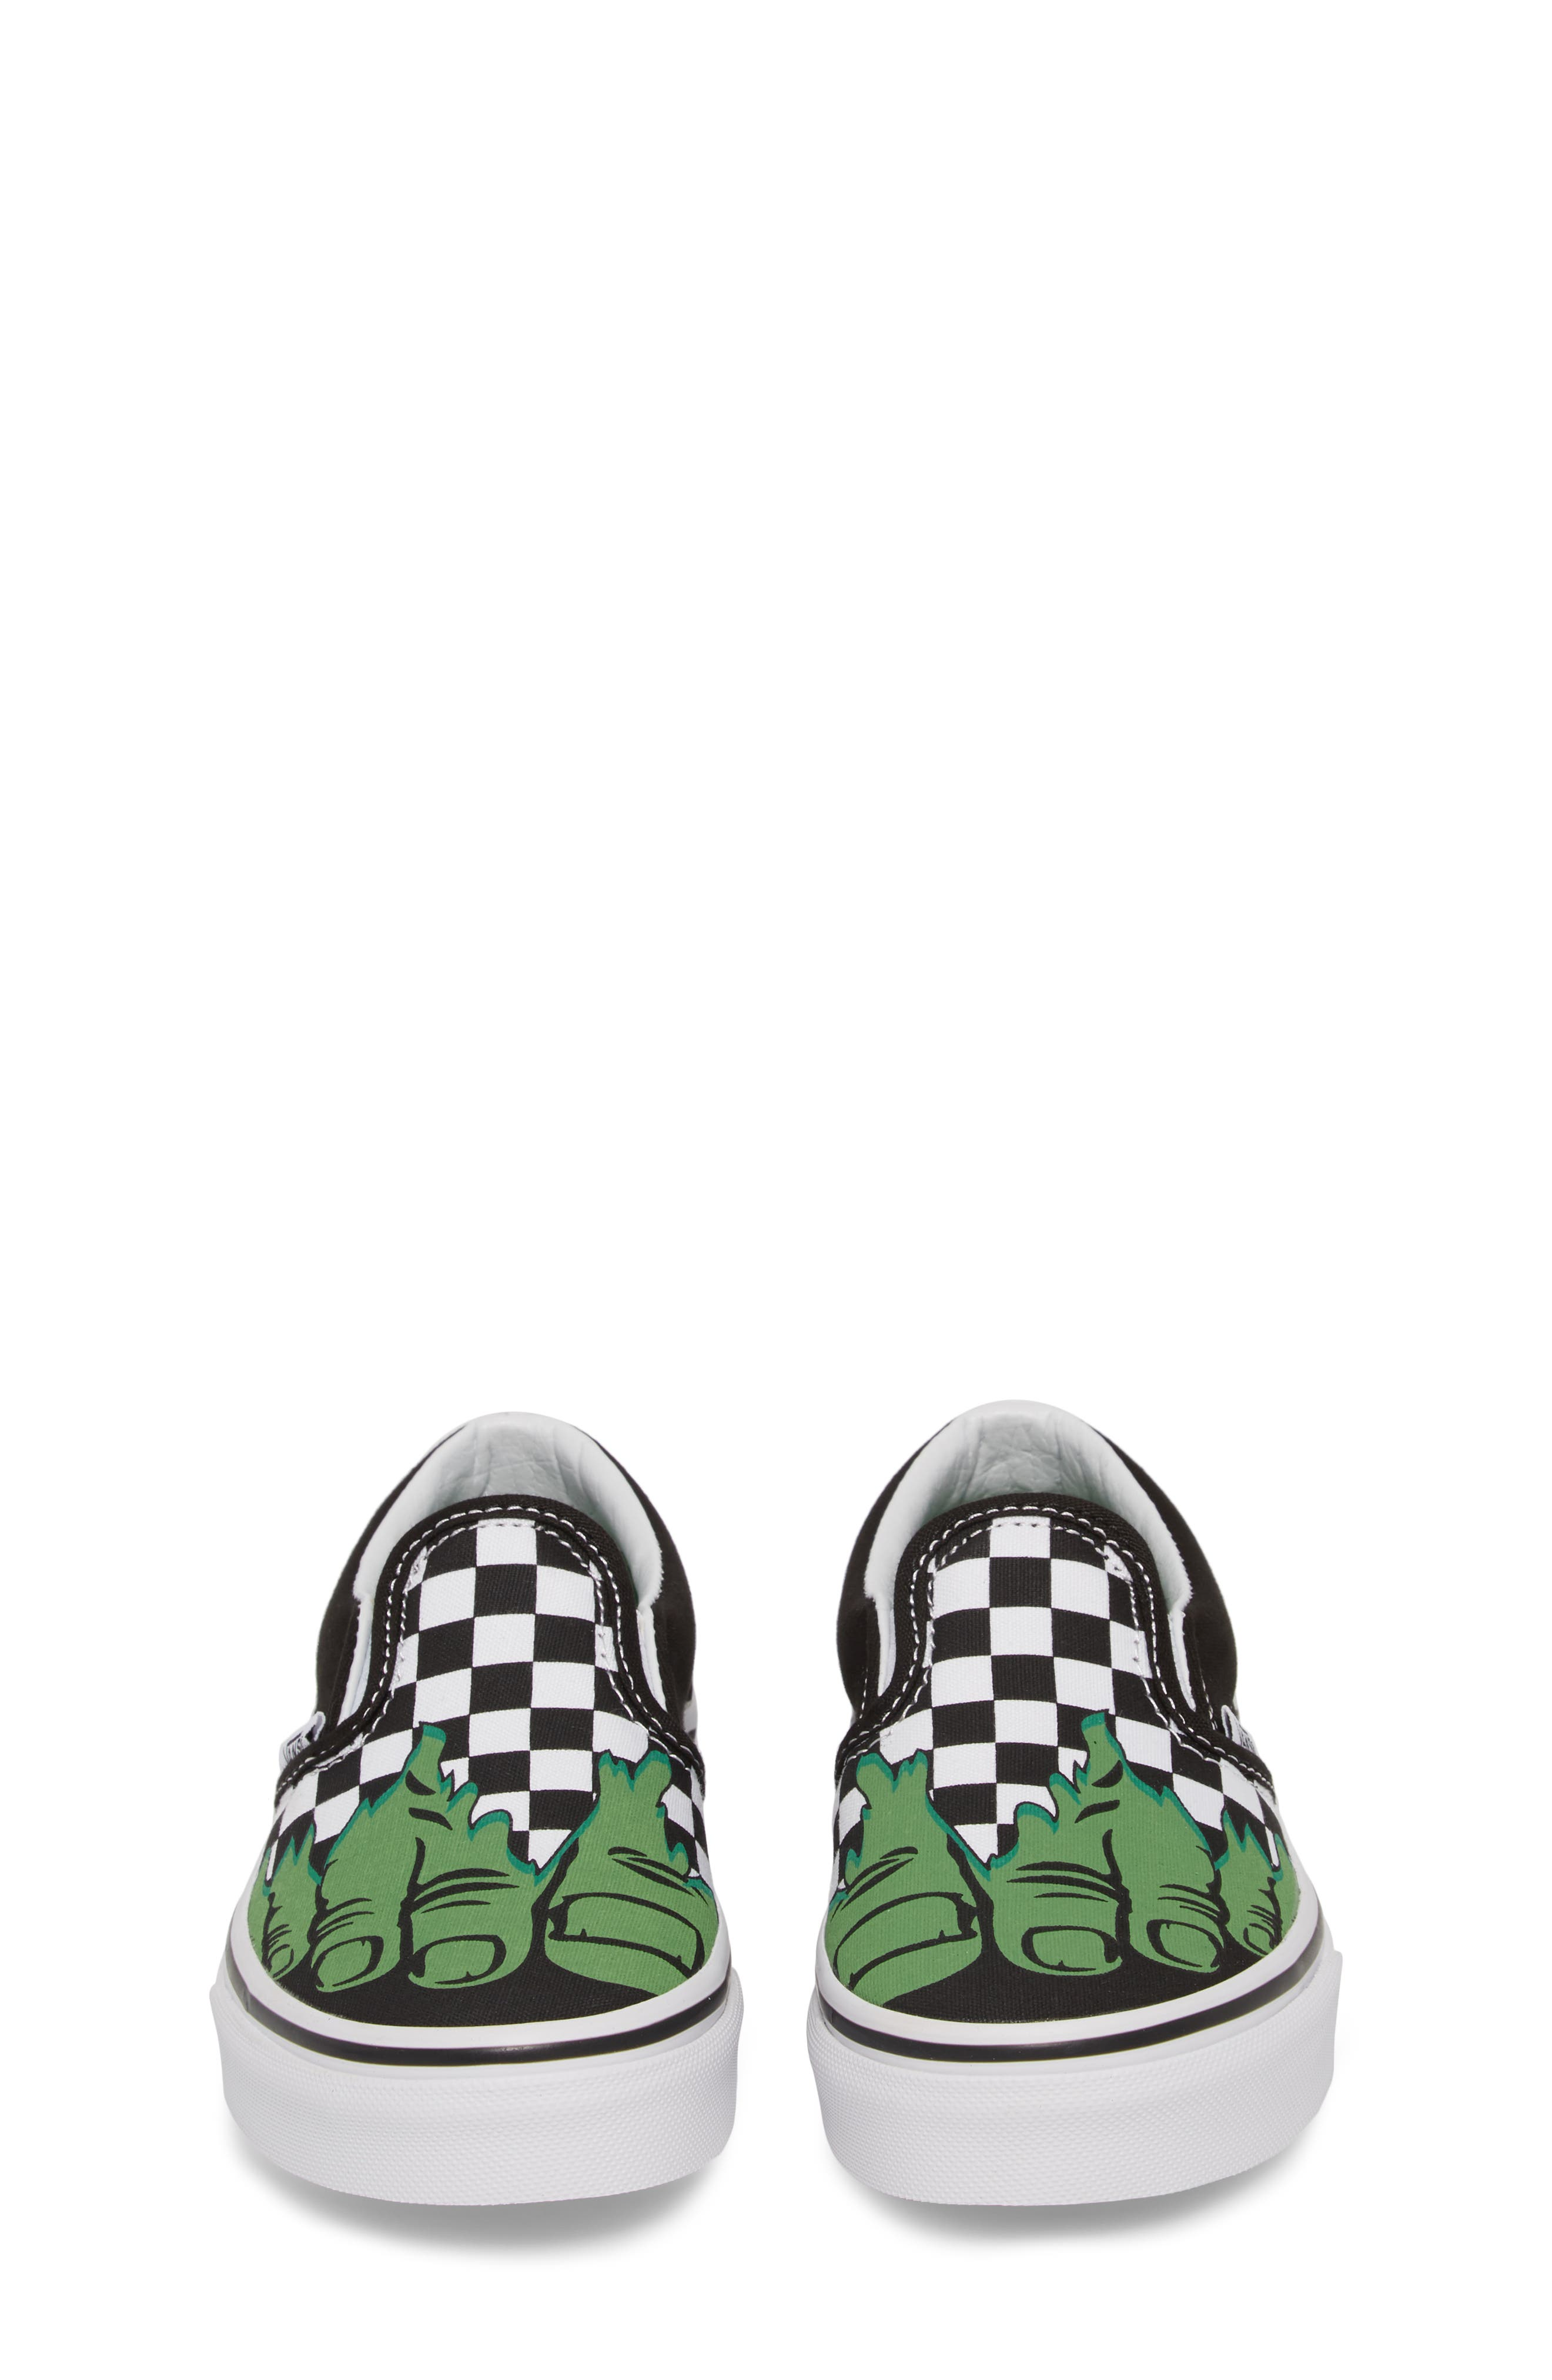 x Marvel<sup>®</sup> Hulk Checkerboard Slip-On Sneaker,                             Alternate thumbnail 5, color,